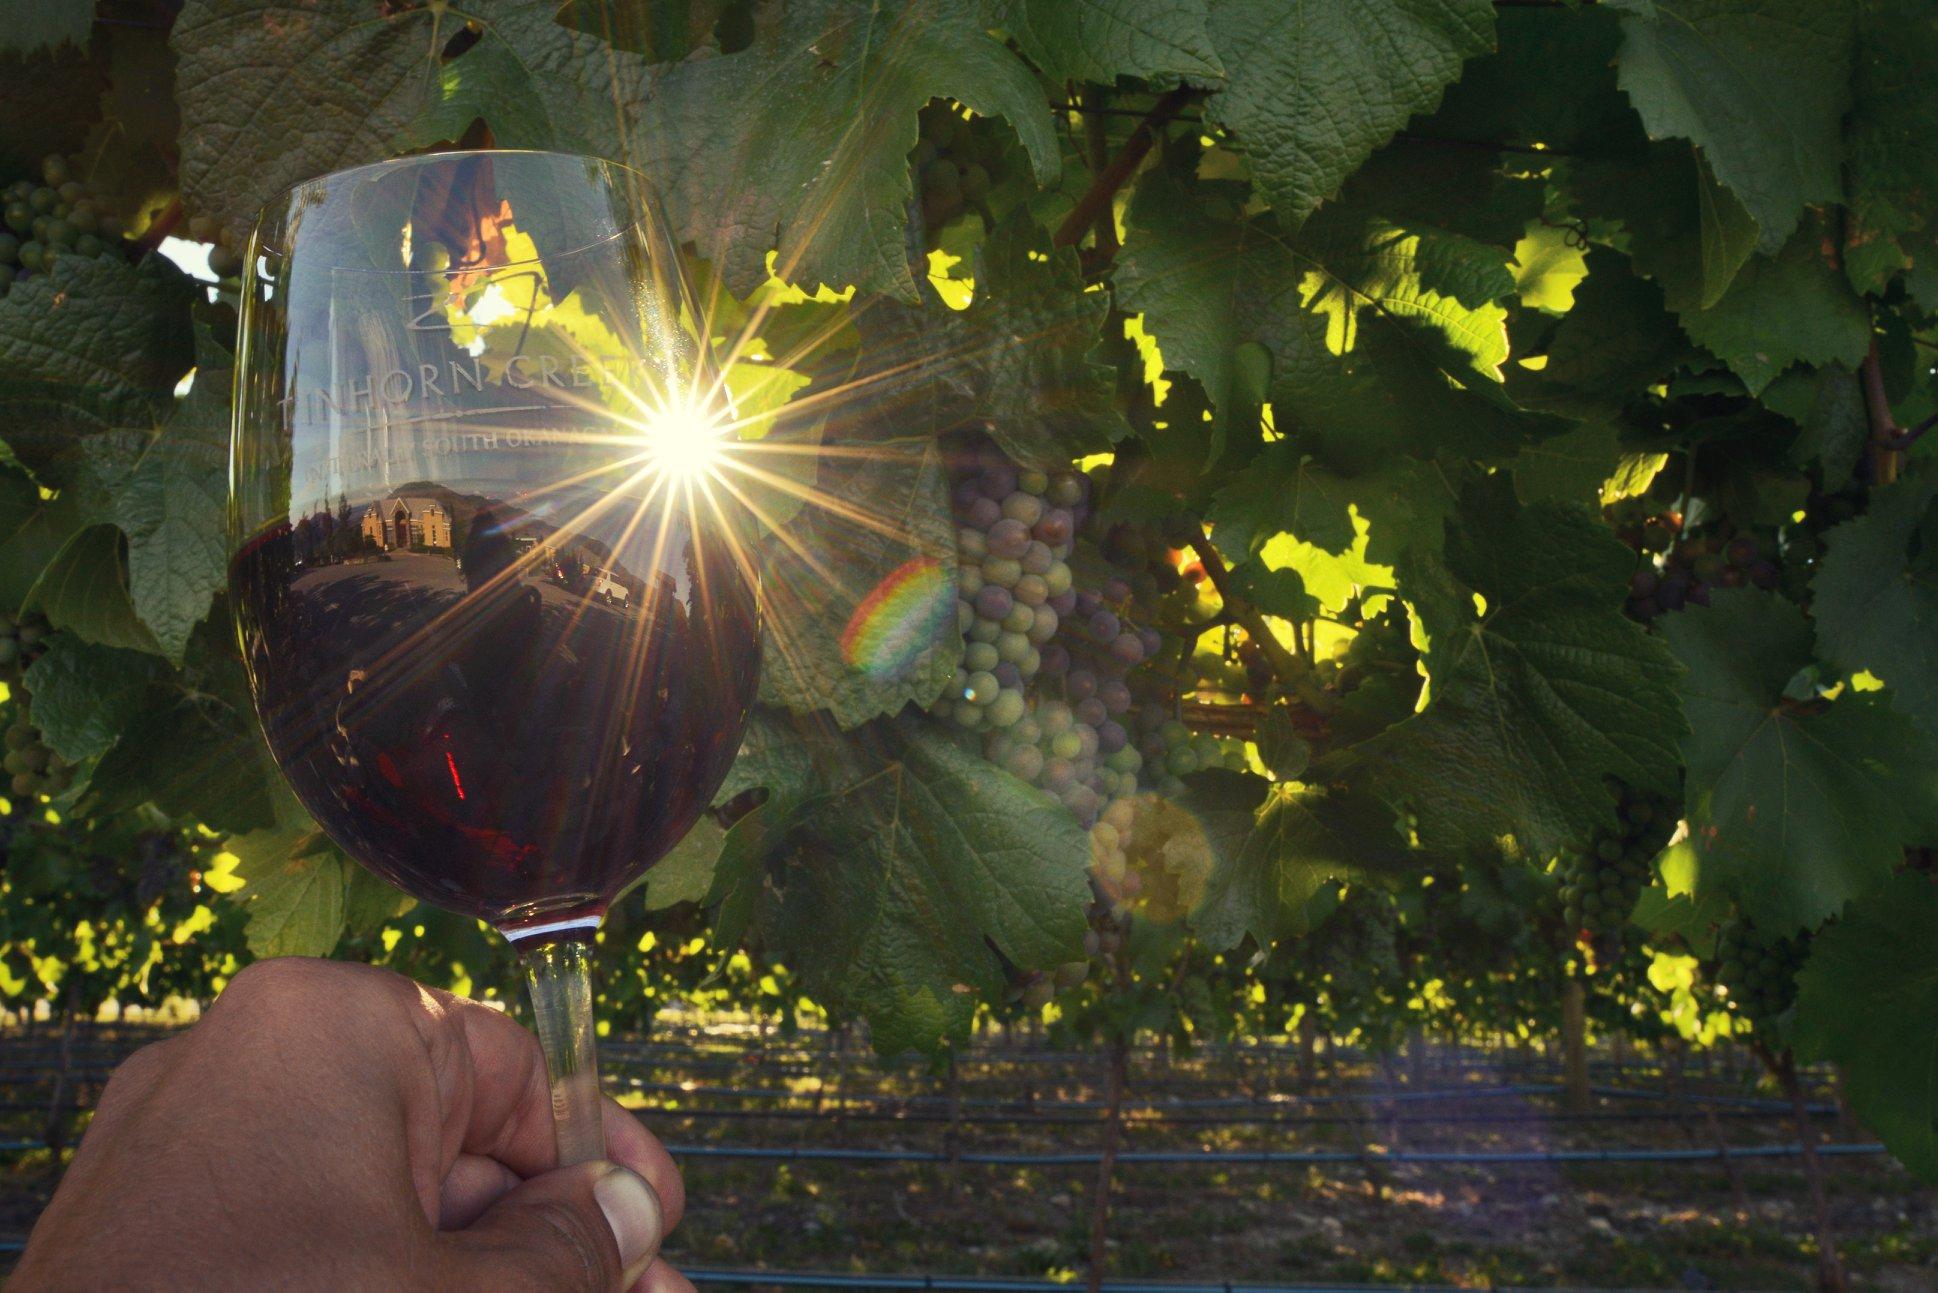 Whirlwind Okanagan Trip Wine Tasting Experiences – Tinhorn Creek